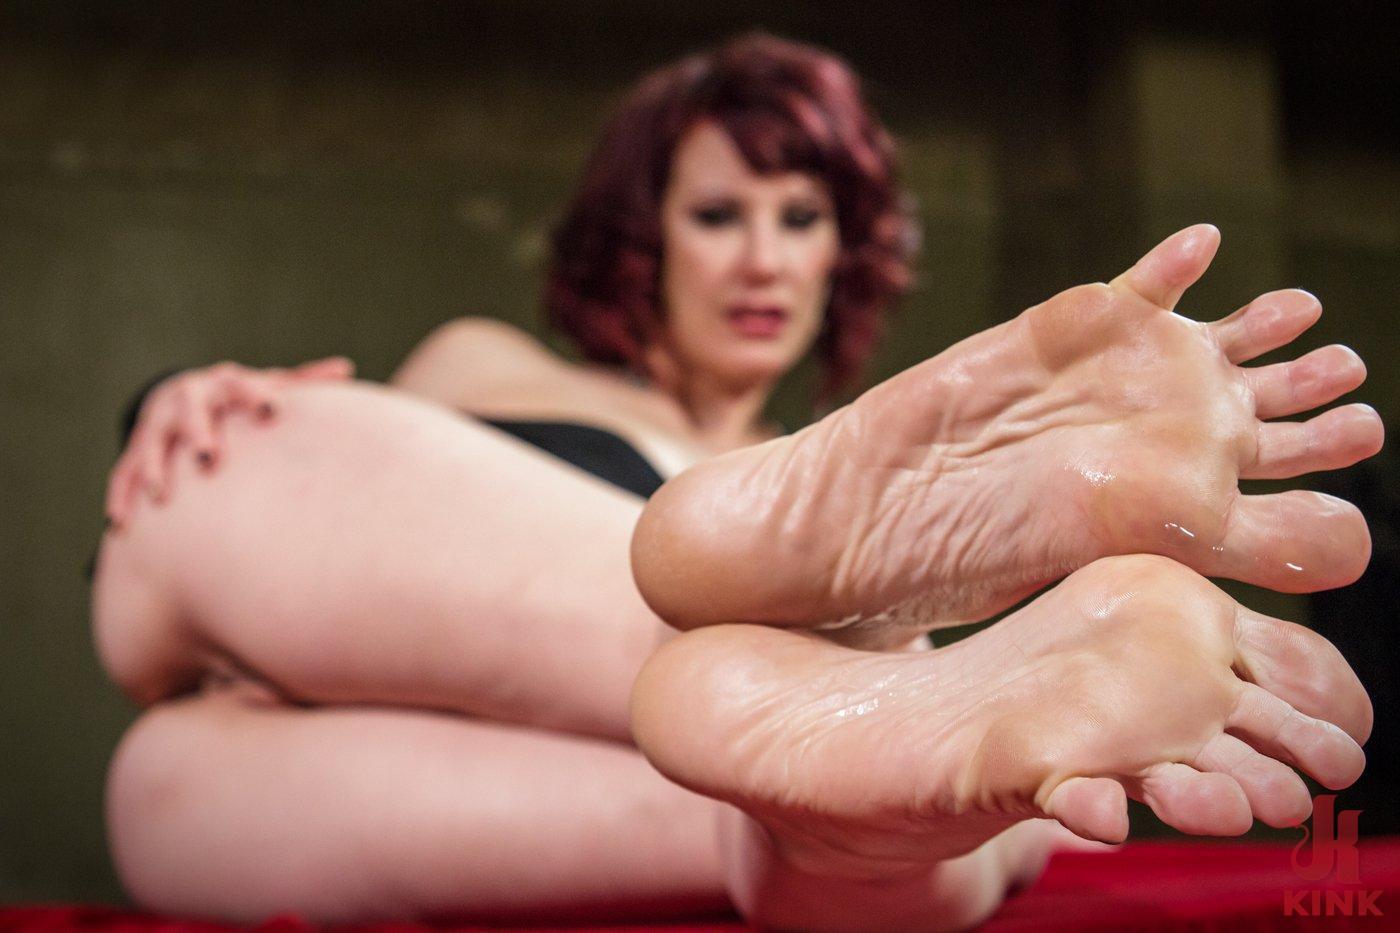 kink.com foot worship